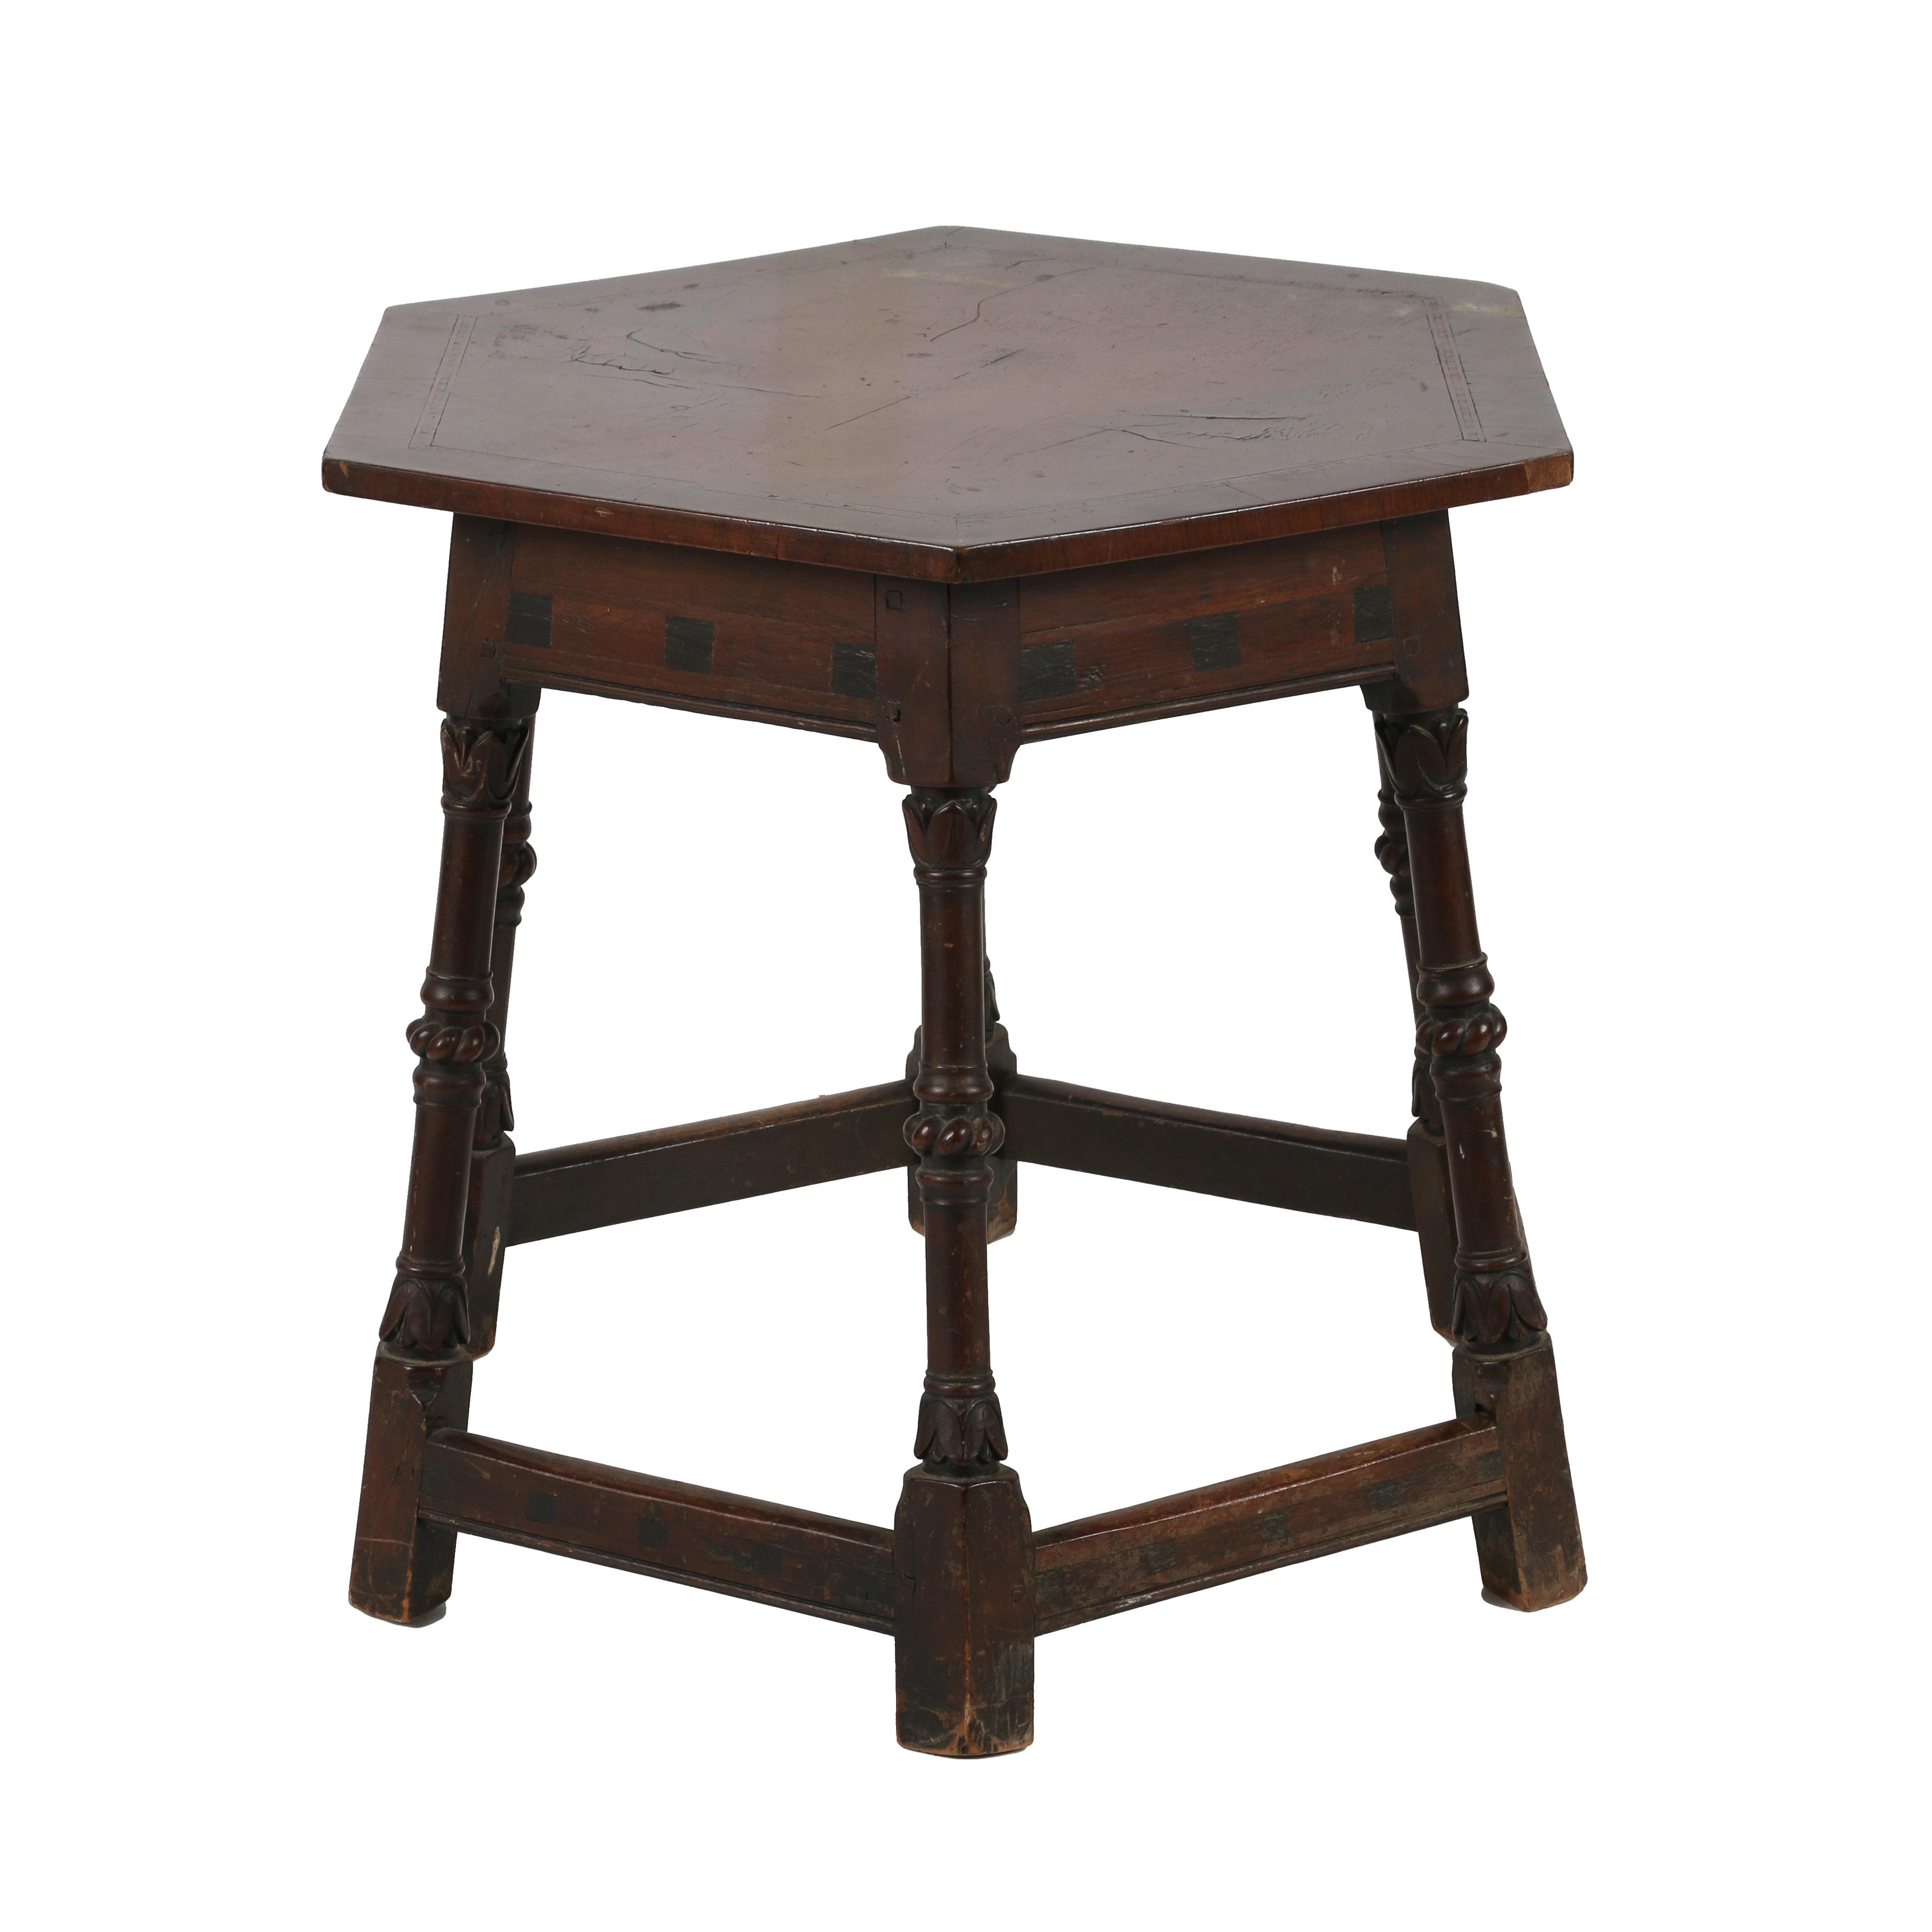 Vintage English Revival Side Table